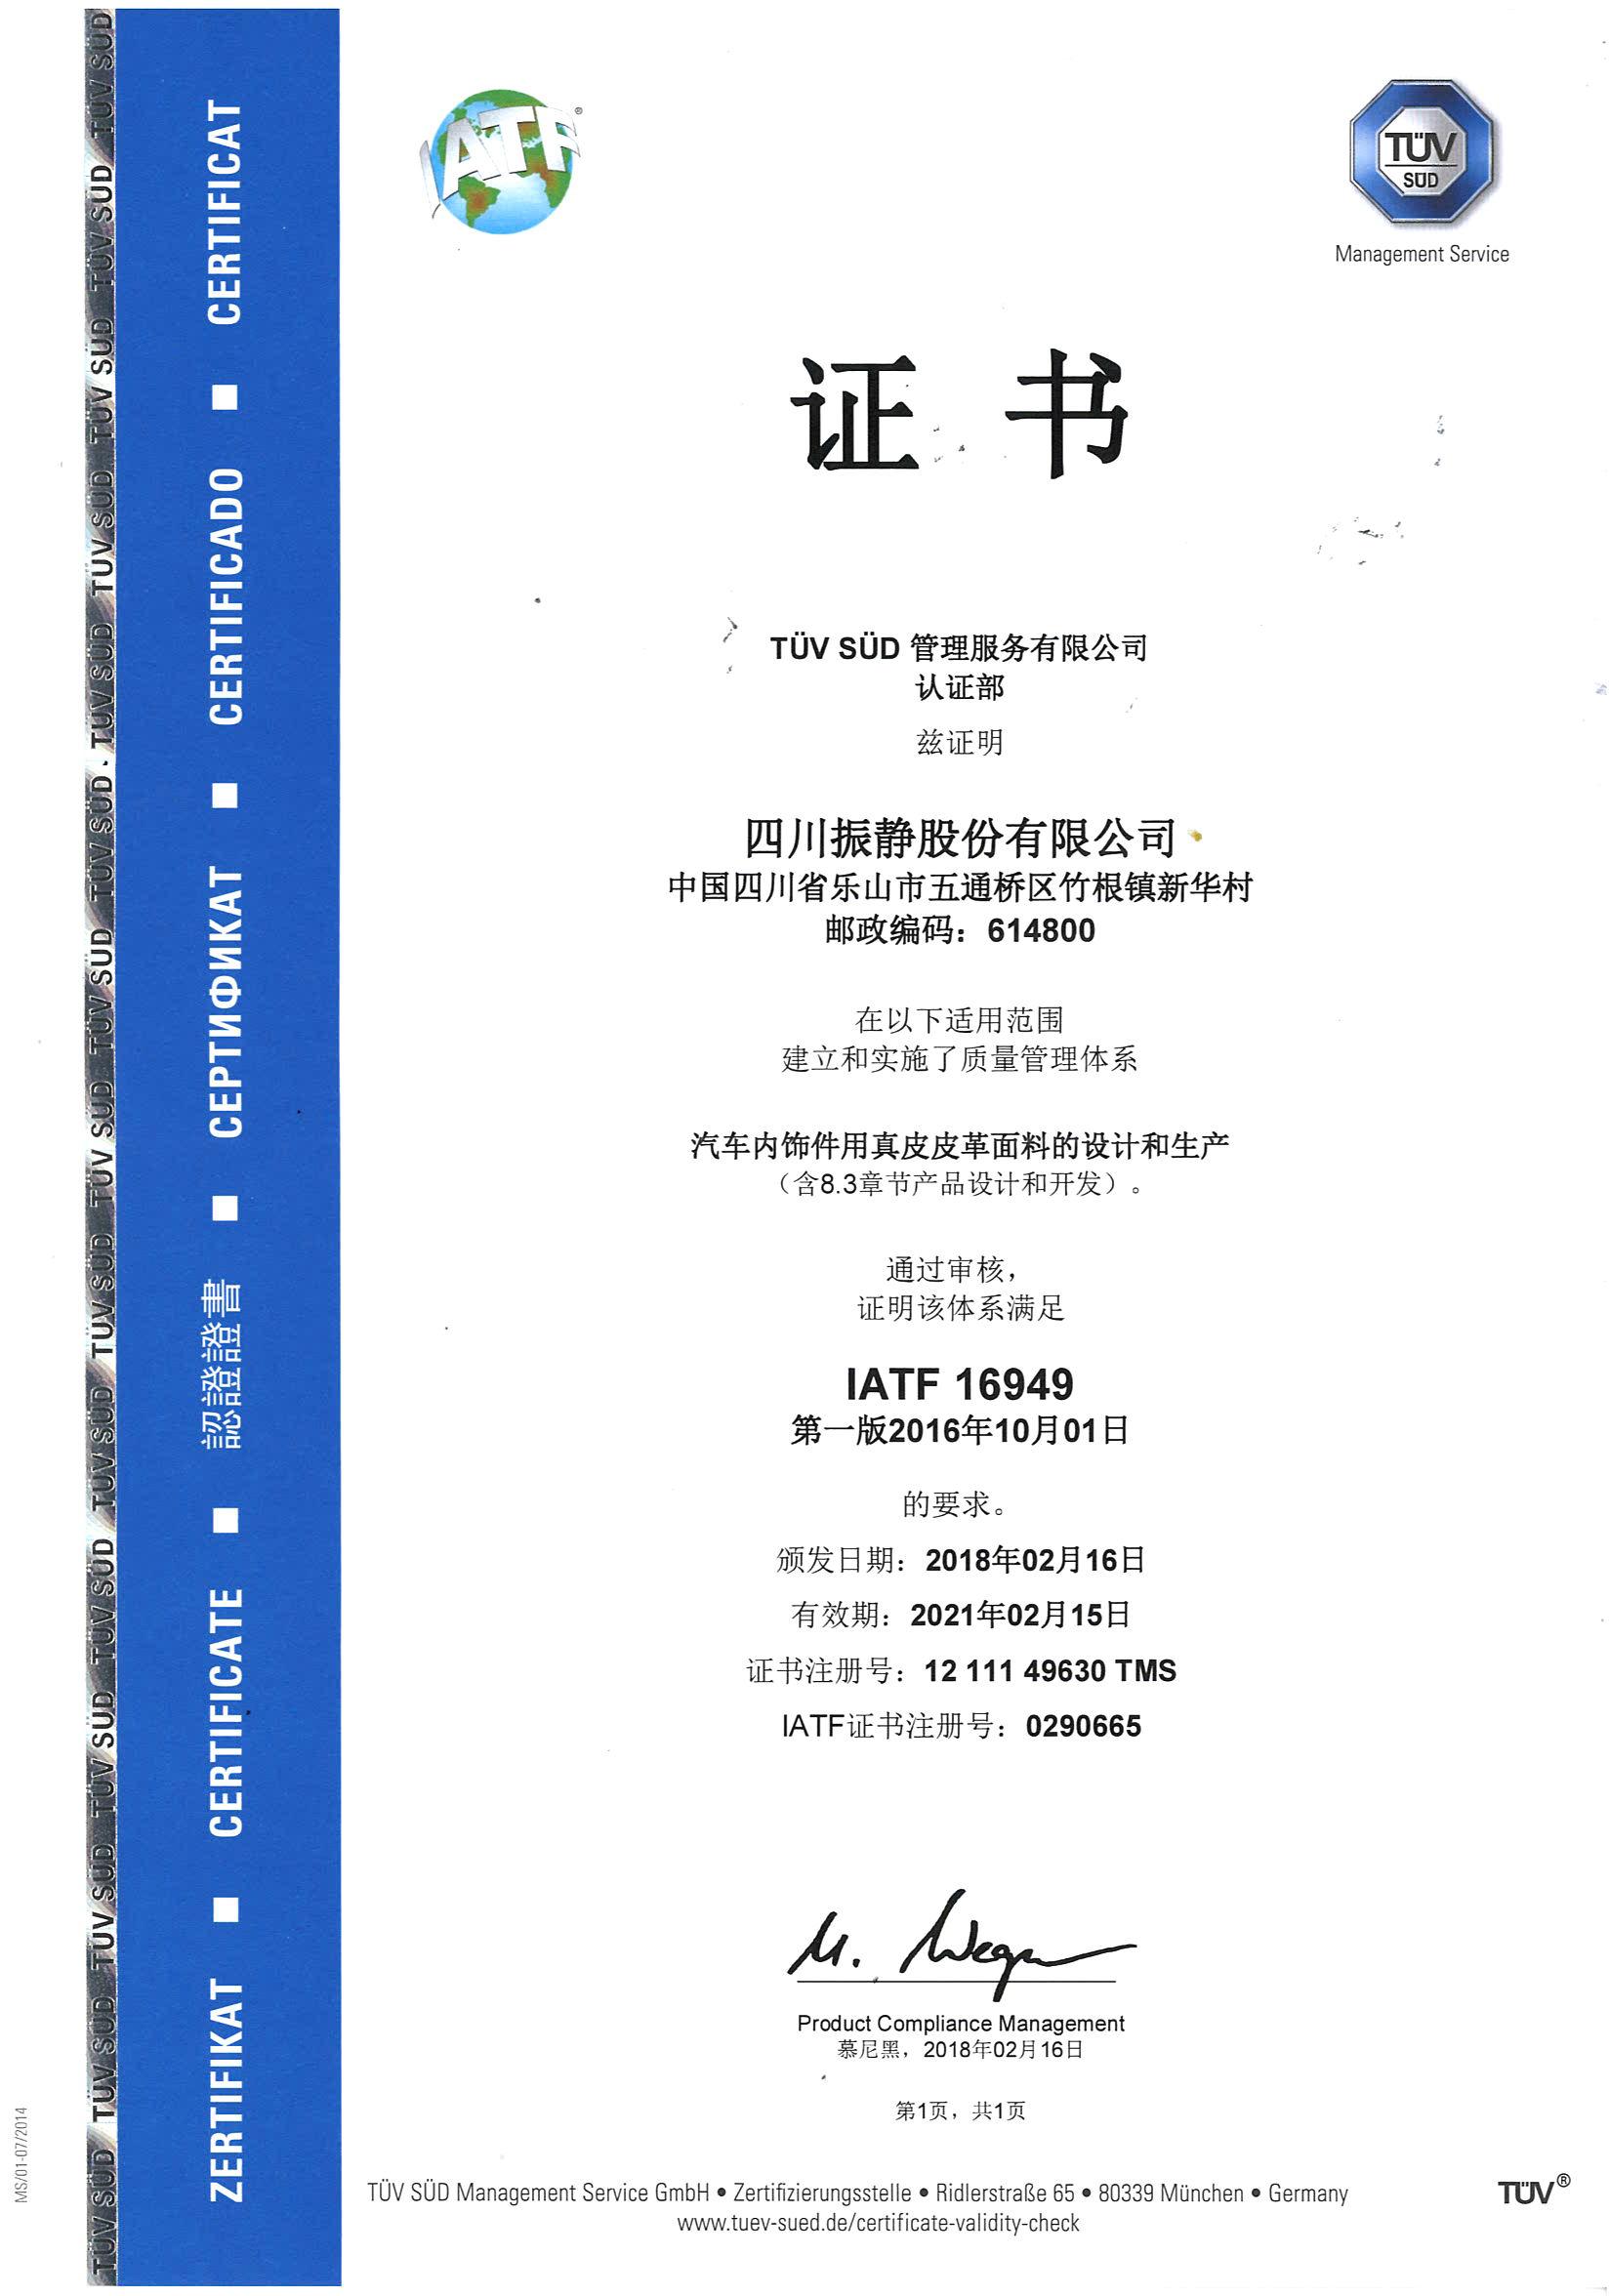 IATF16949證書-20210215前有效